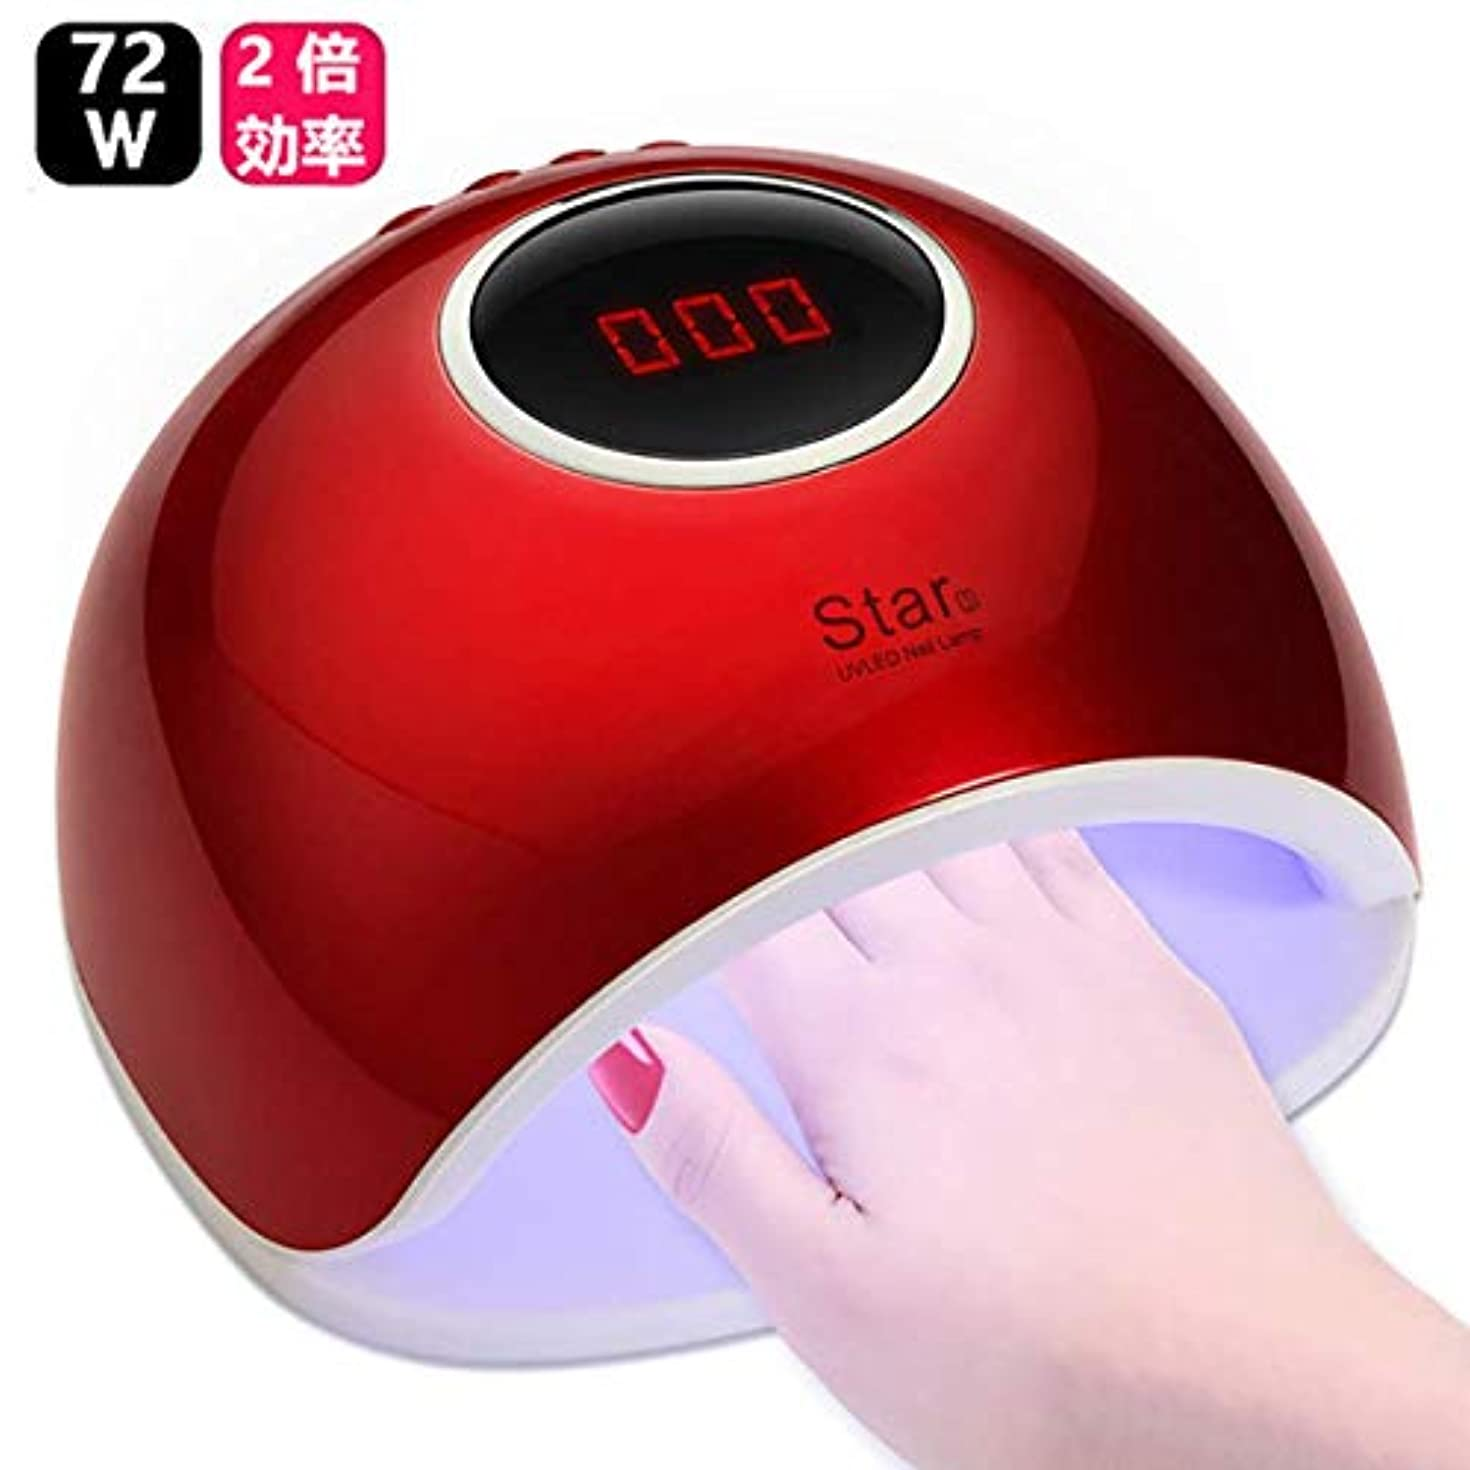 UV LEDネイルドライヤー 赤外線検知 72W2倍の効率 赤外線美白機能付き マニキュア用 4段階タイマー設定可能 手足兼用 (レッド)